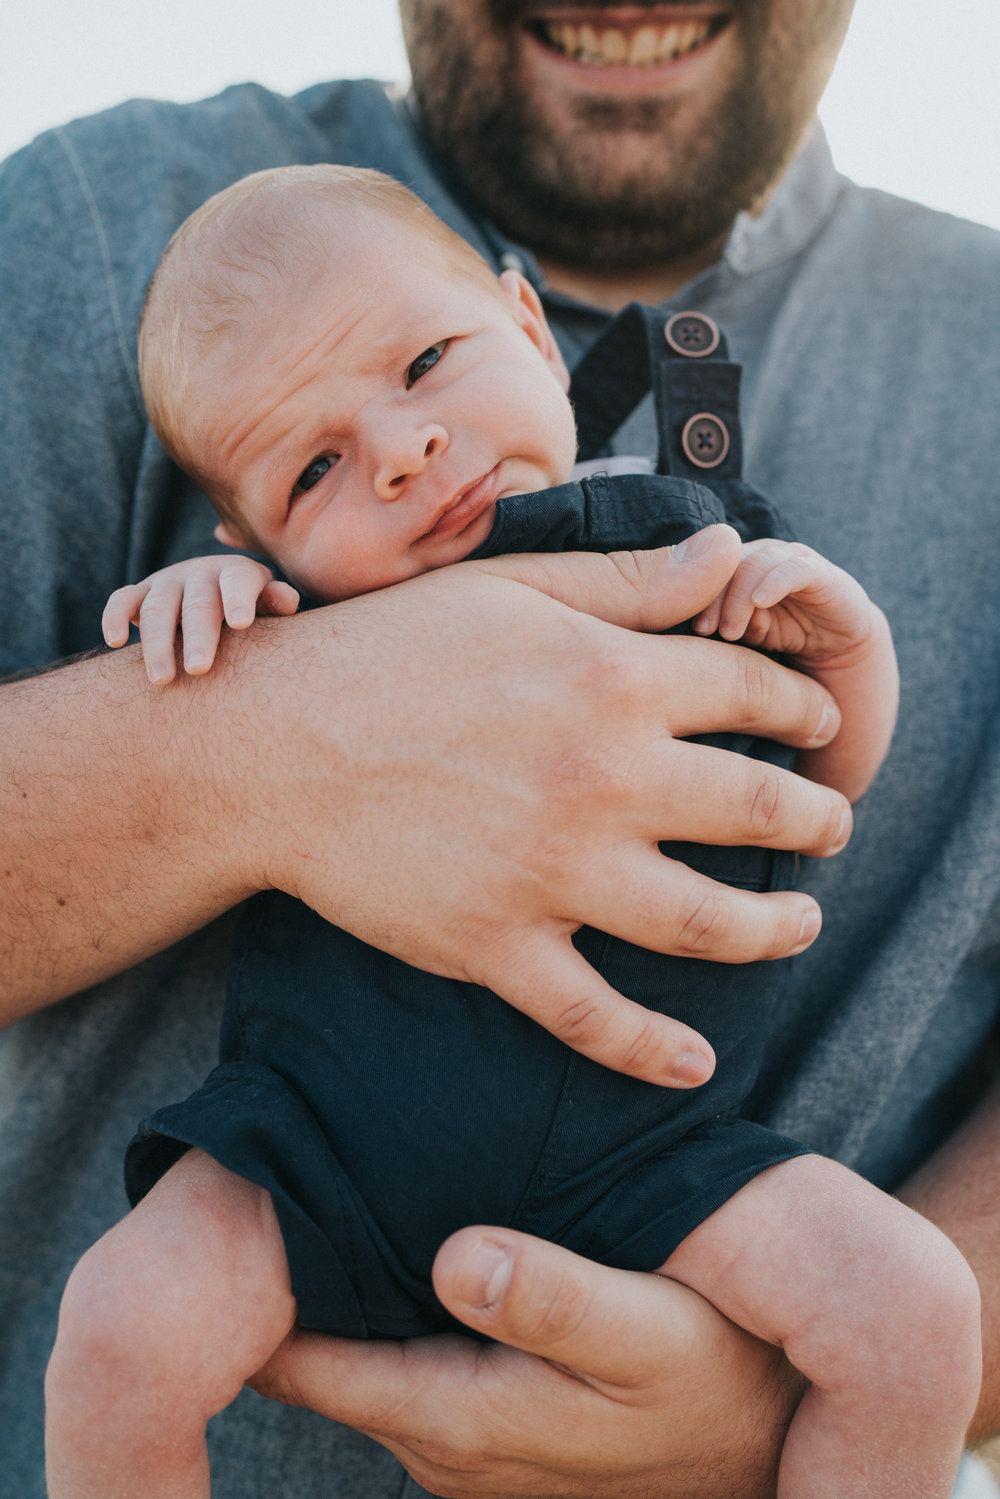 Newborn-Baby-Cooper-Grace-Elizabeth-Alternative-Wedding-Photographer-Colchester-Essex-Mersea-Island-33.jpg